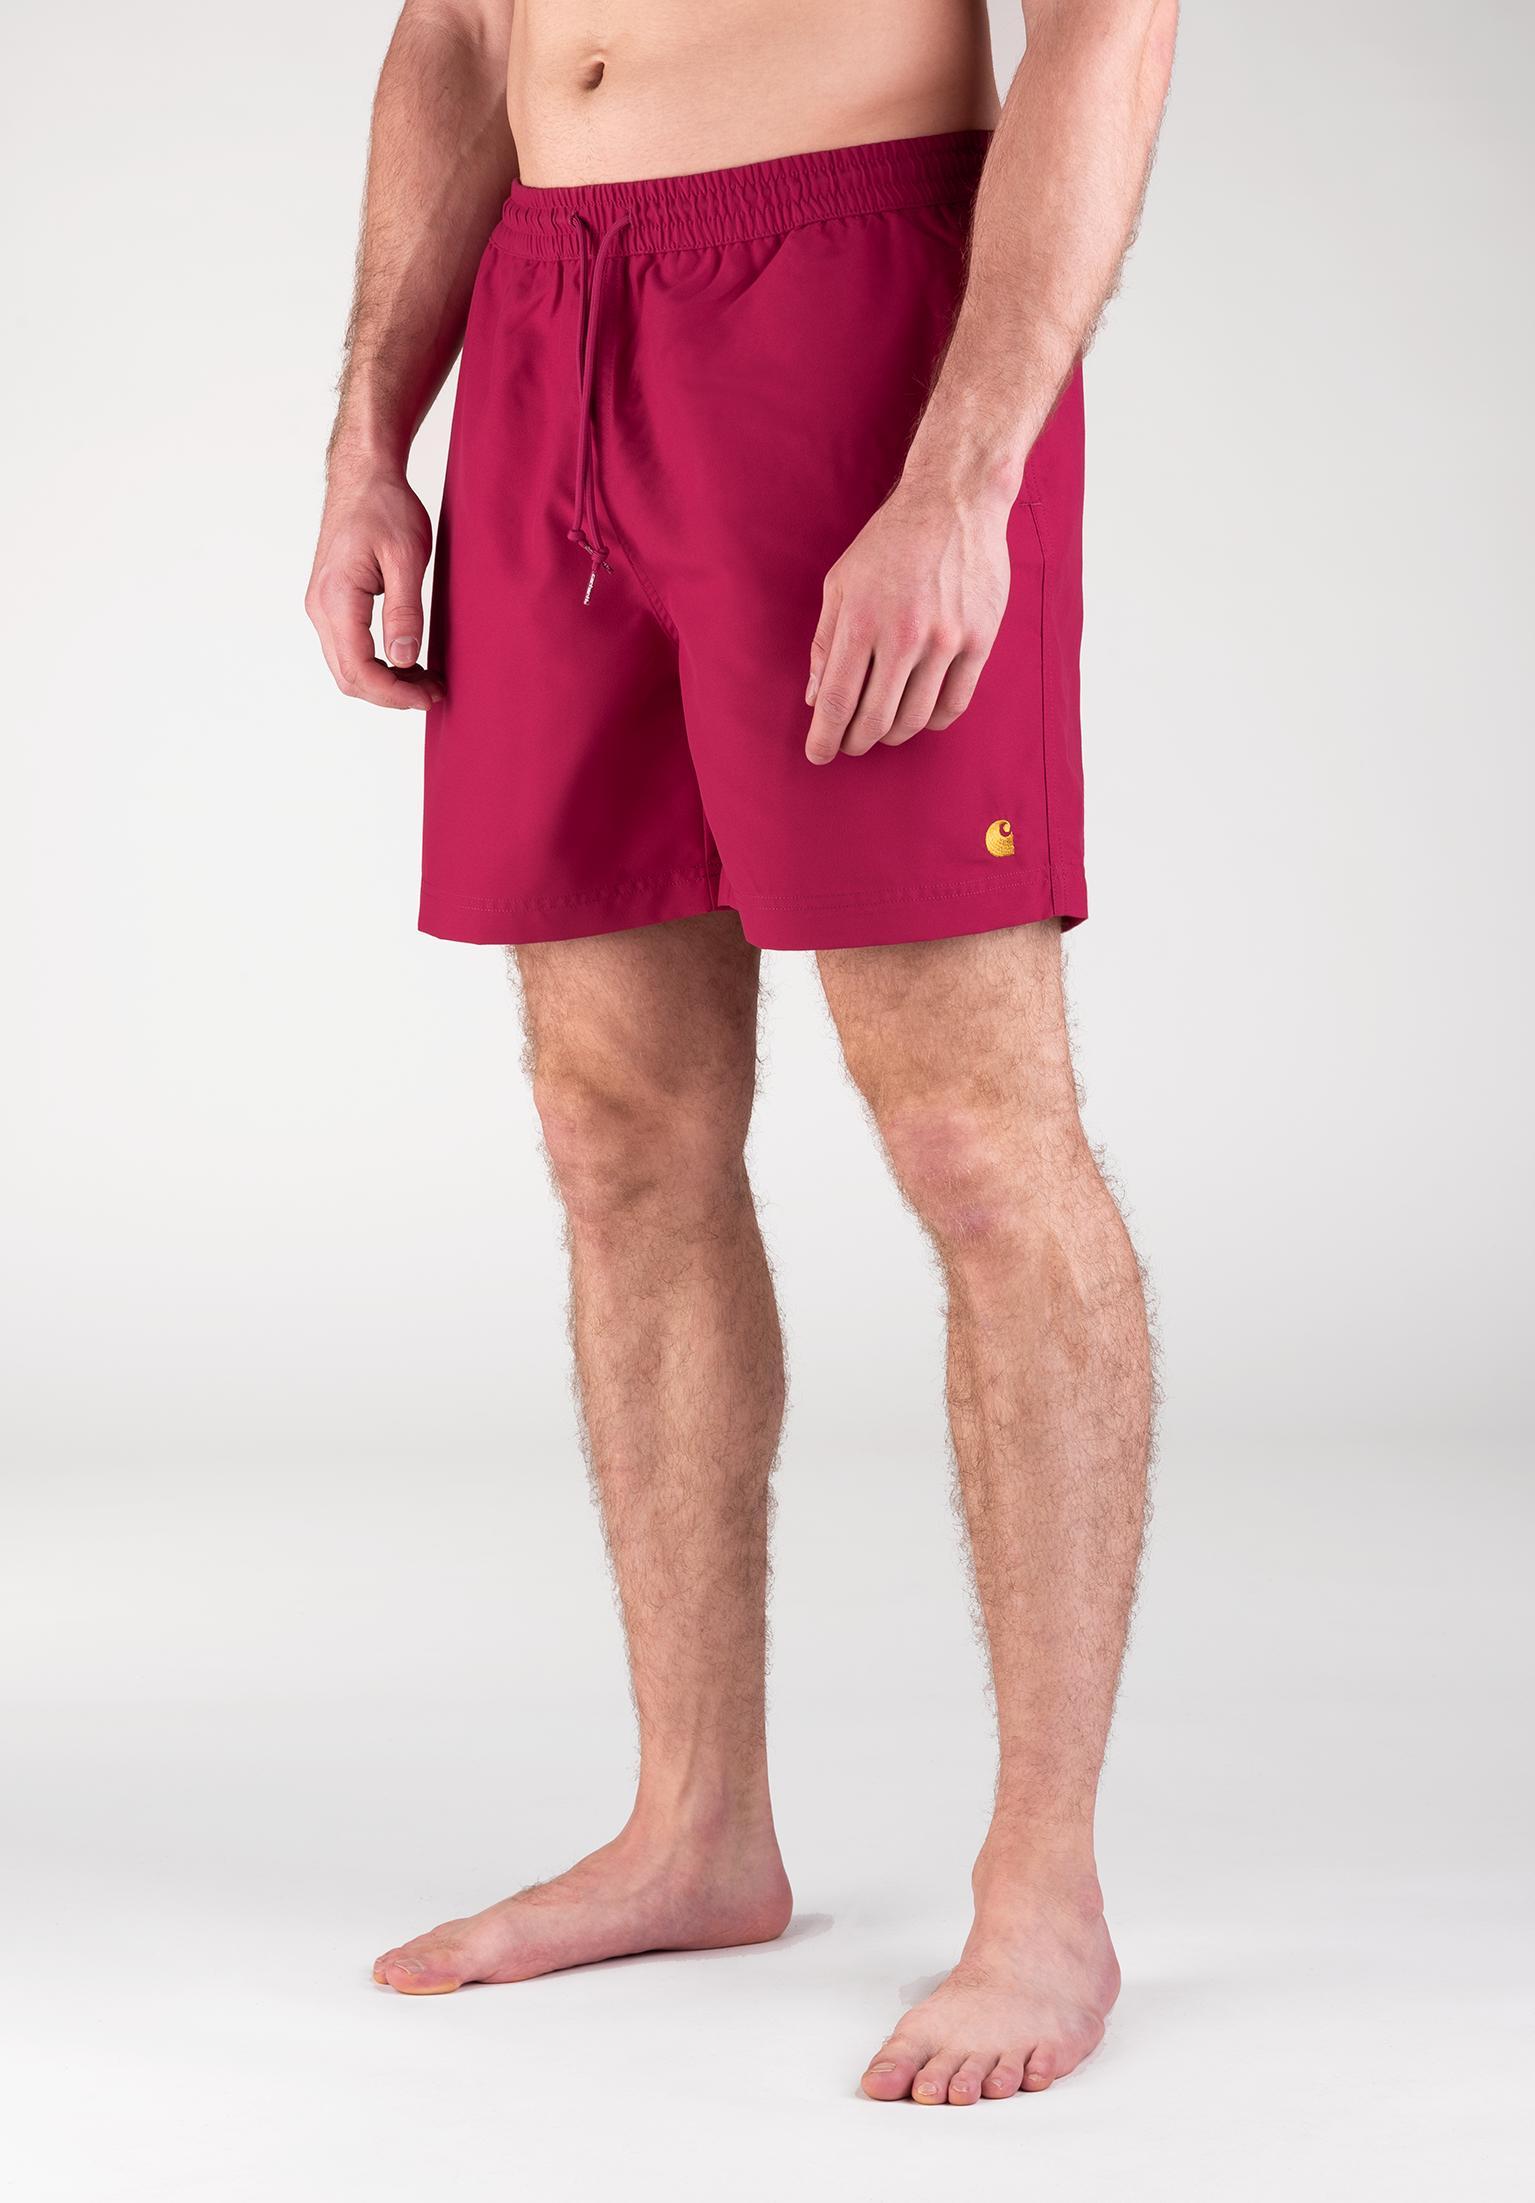 8ed5ff7c2e Chase Swim Trunk Carhartt WIP Beachwear in tango-gold for Men   Titus